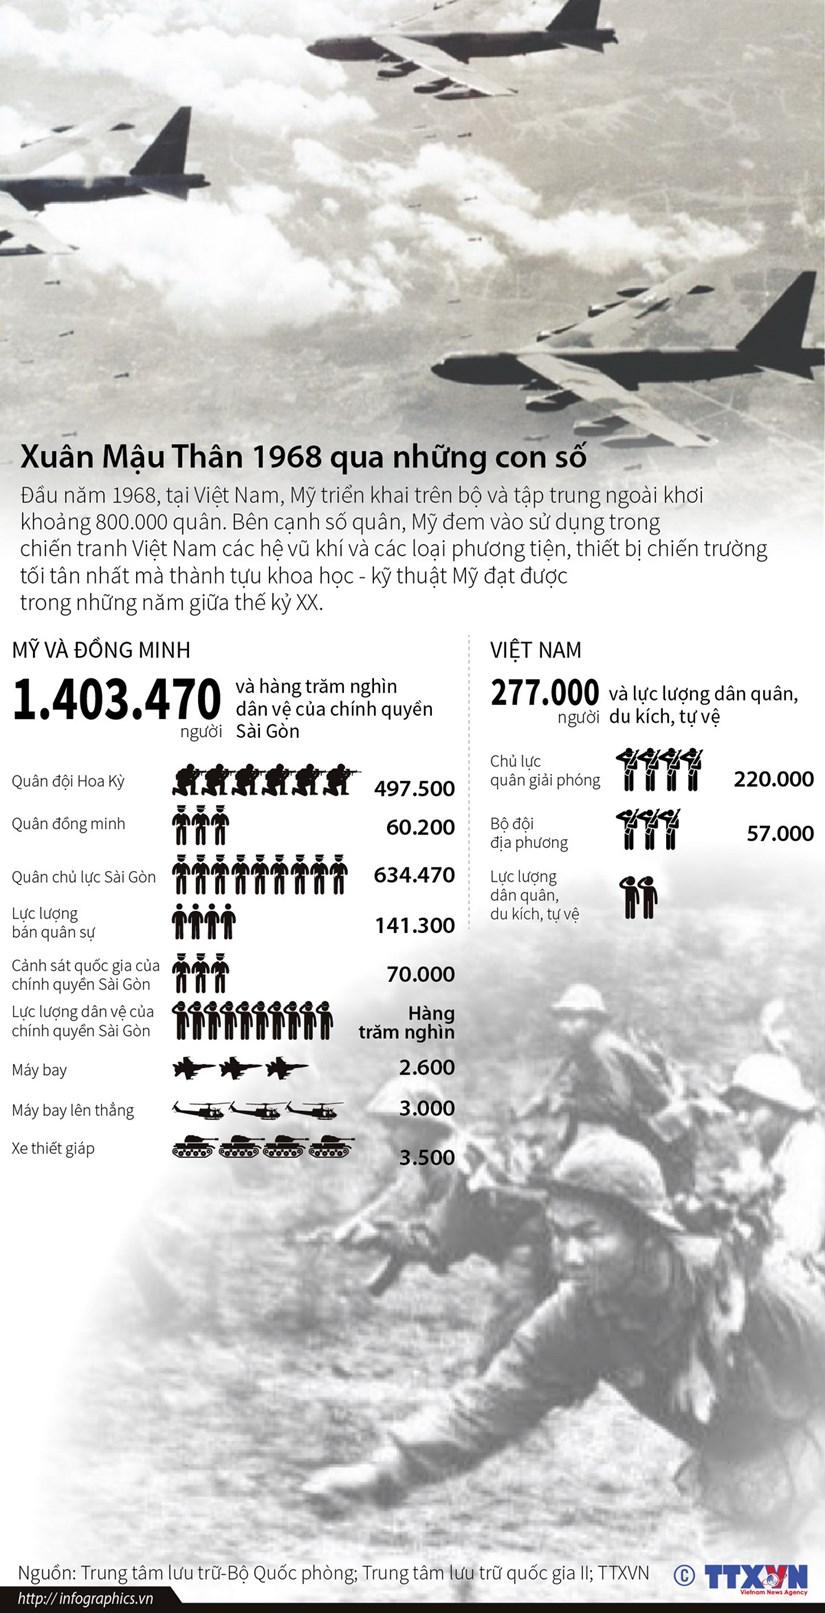 [Infographic] Chien tranh Viet Nam dau nam 1968 qua nhung con so hinh anh 1